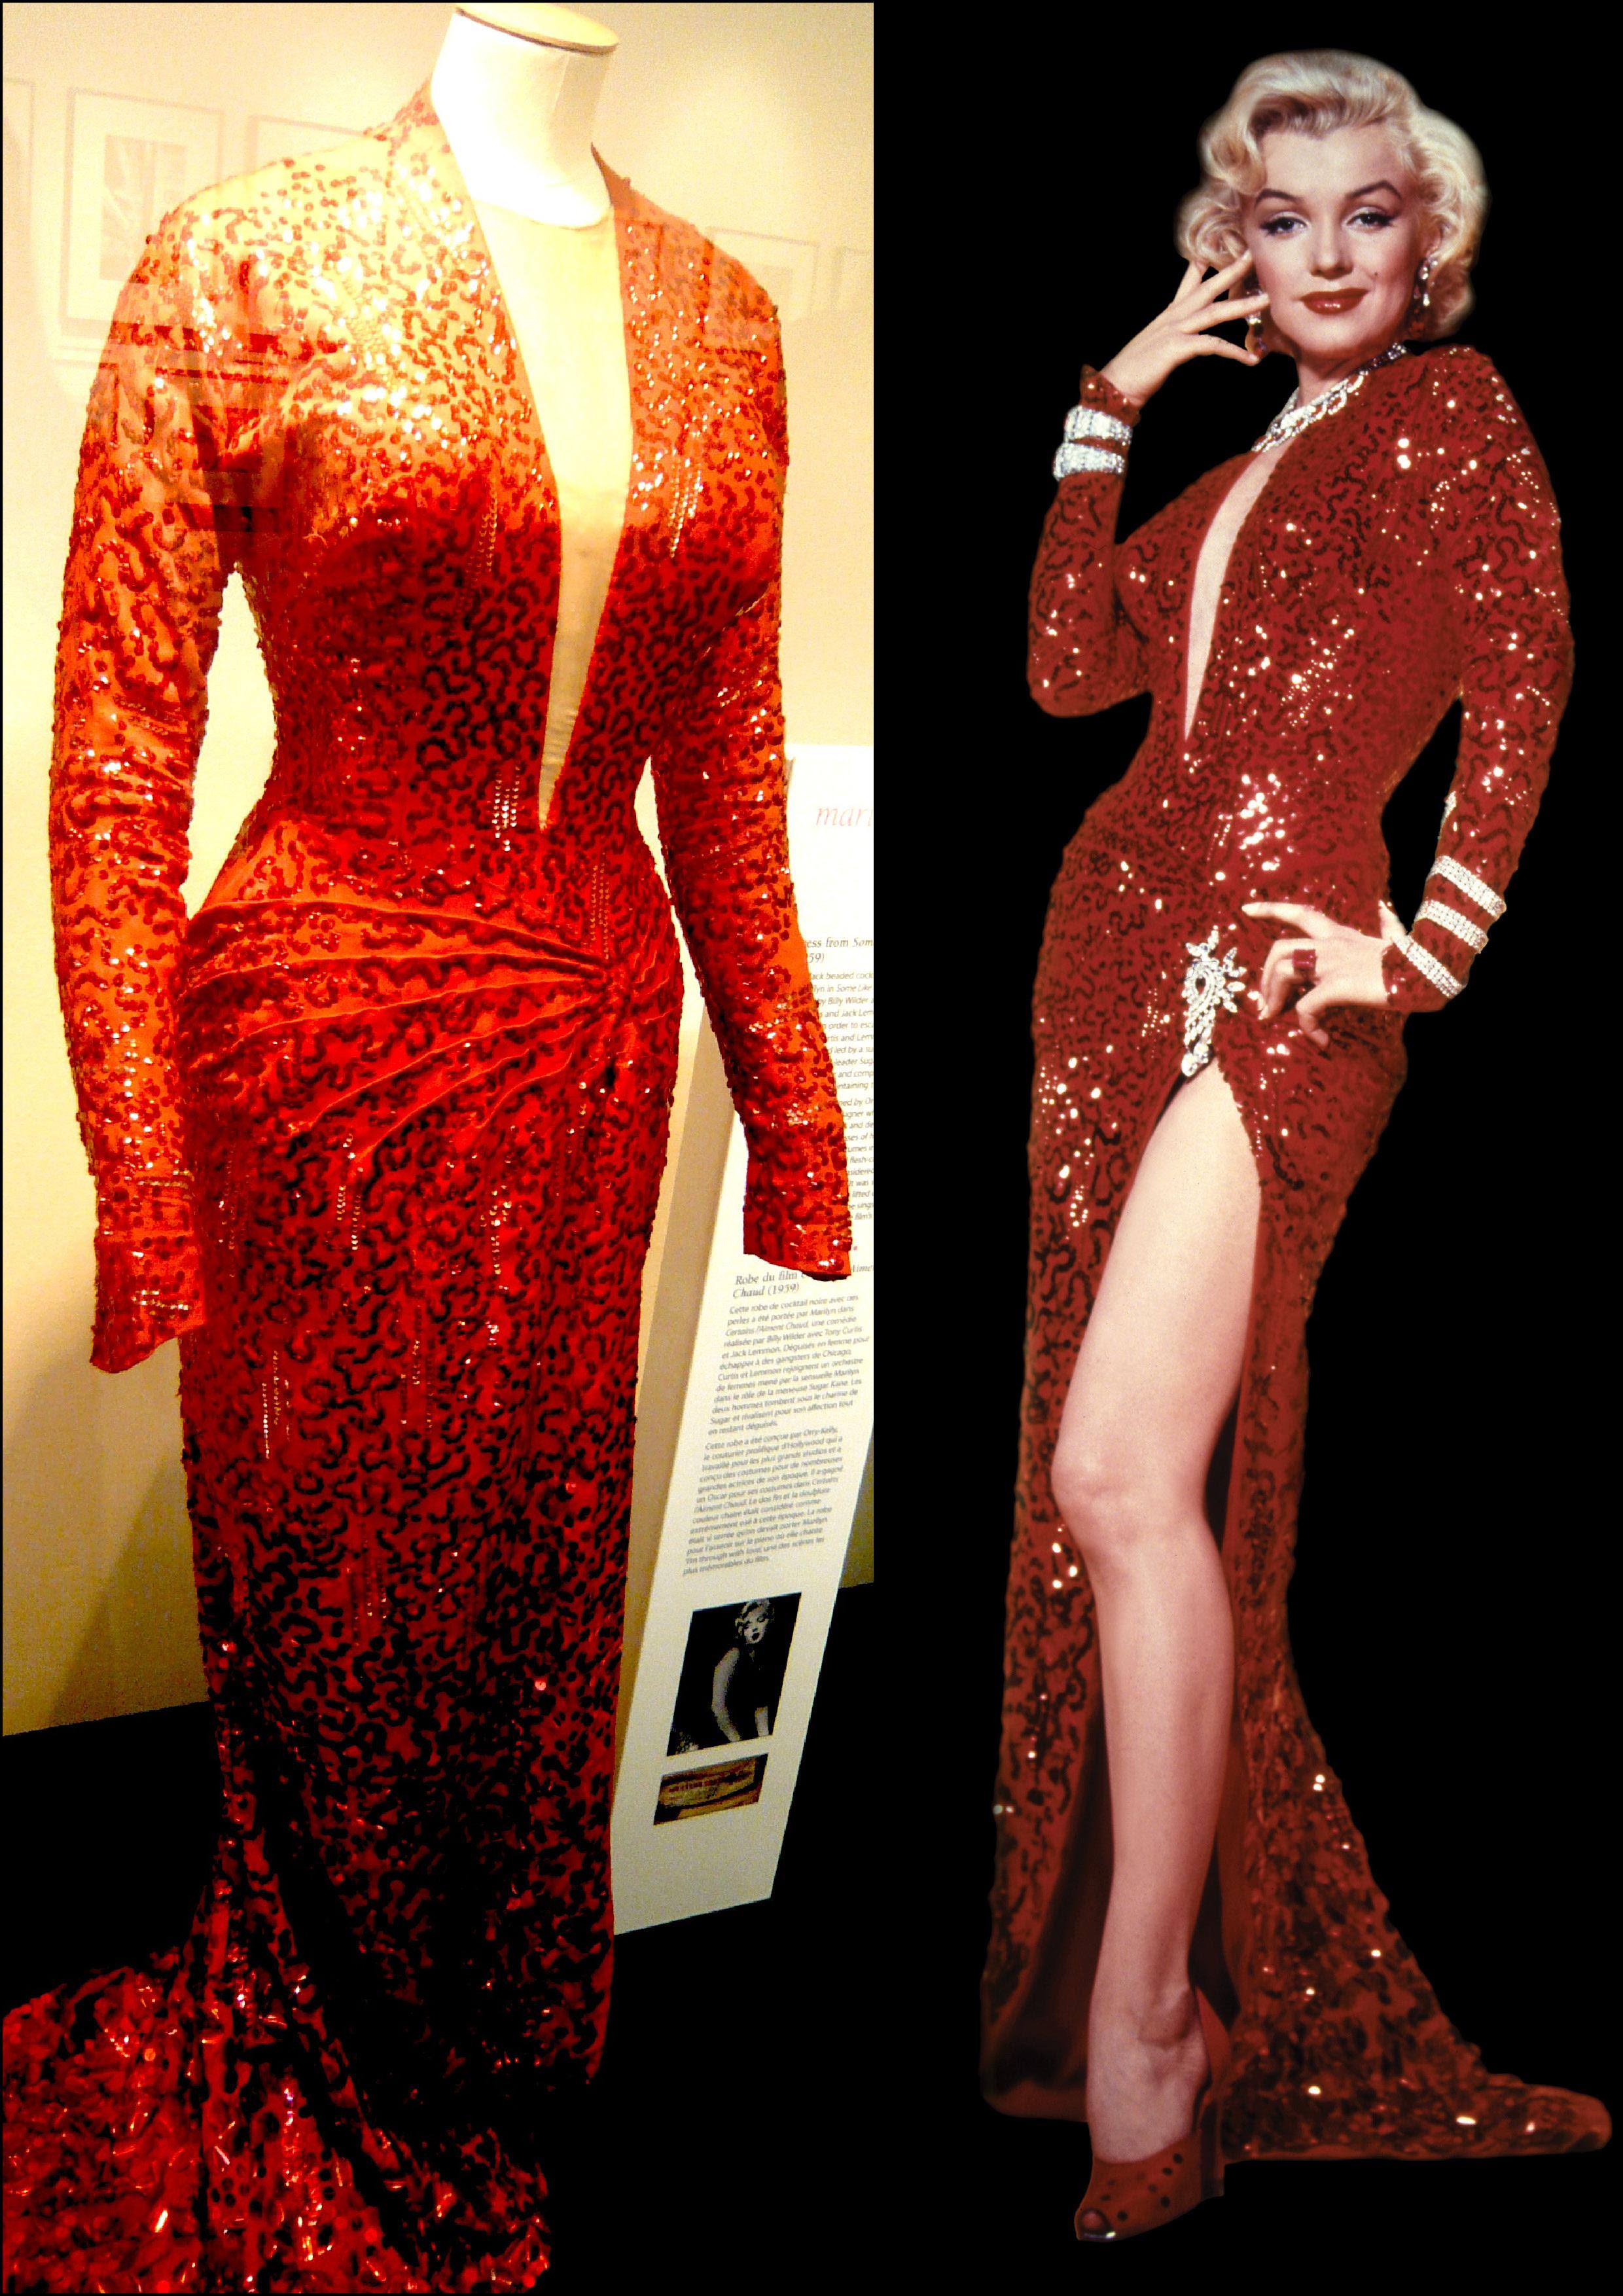 marilynmonroe: NEW MARILYN MONROE PINK DRESS